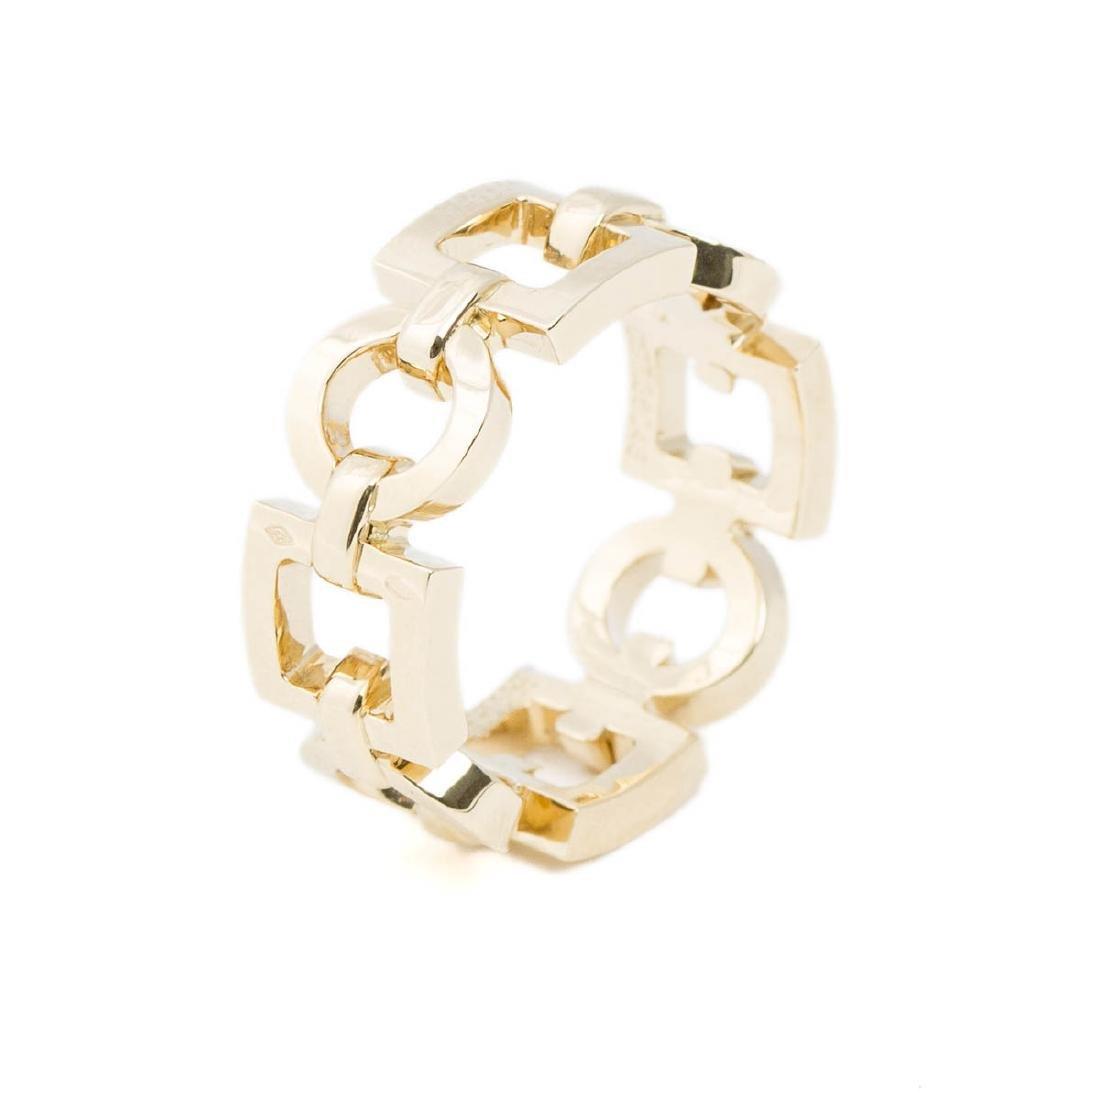 Boucheron Square and Circle Chain Ring